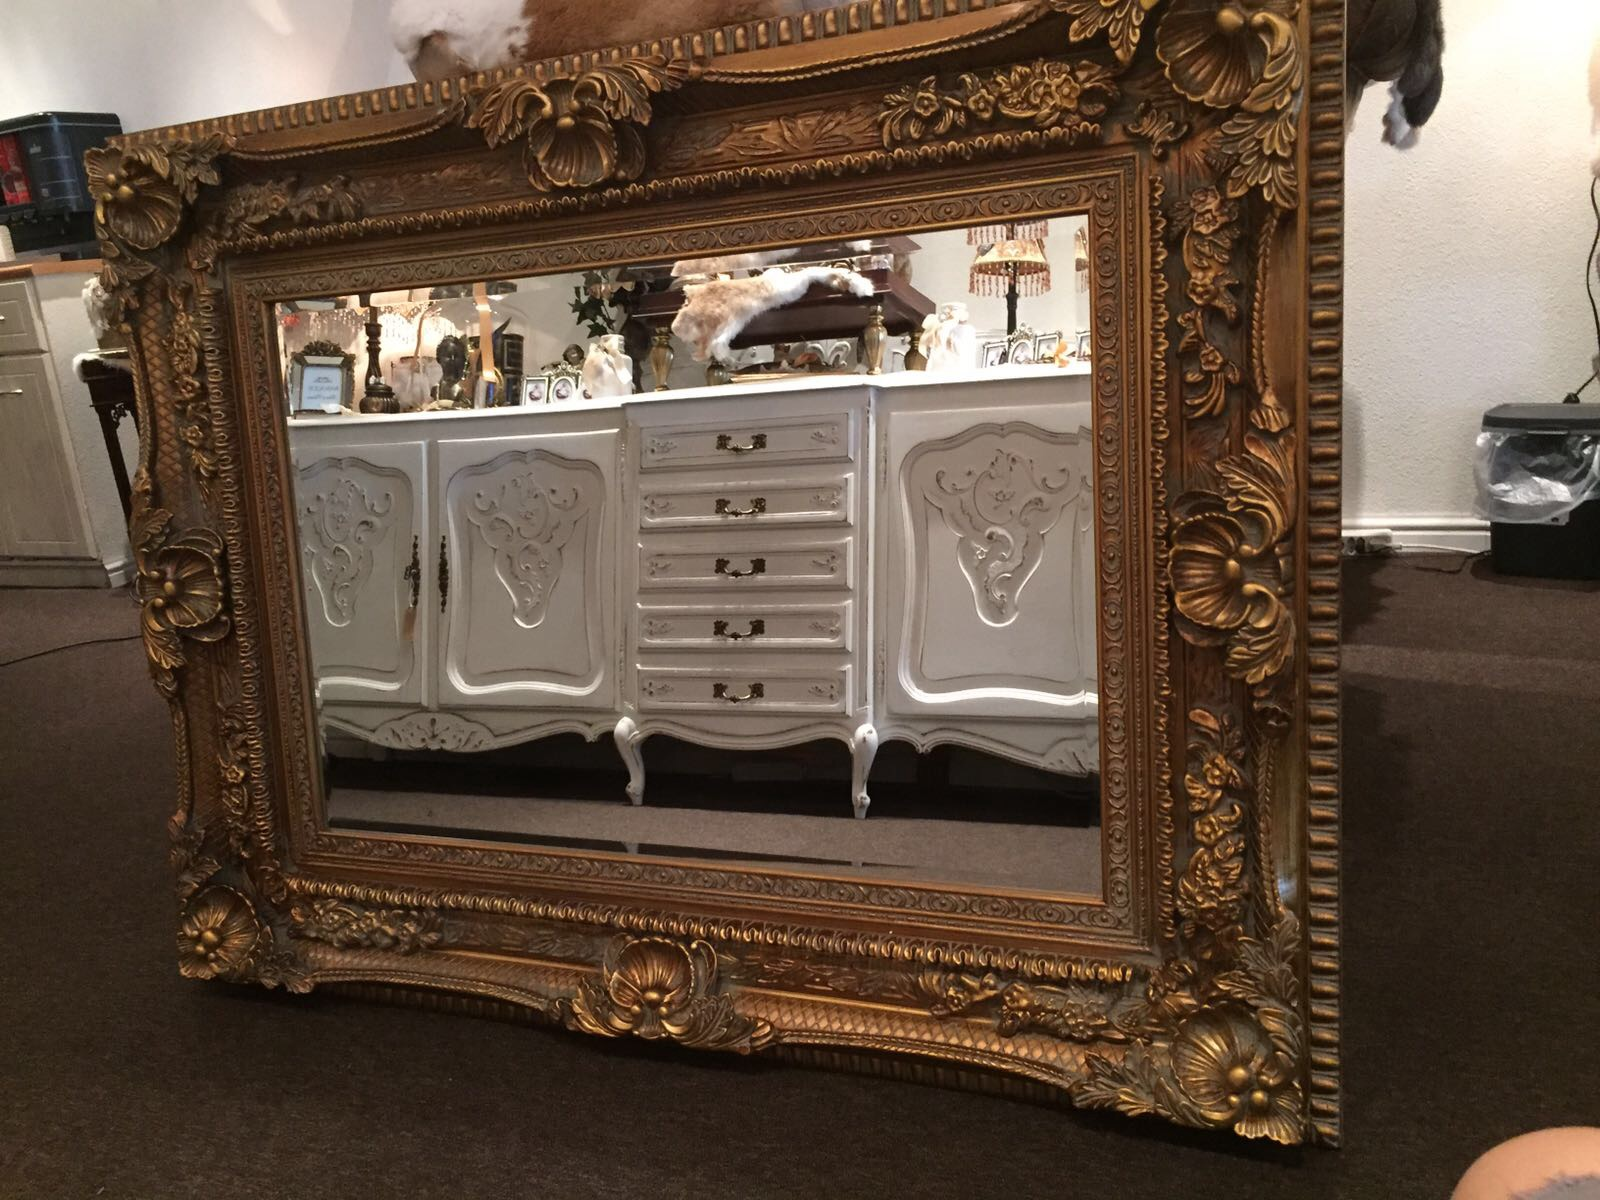 Gouden Barok Spiegel : Gouden barok uitgewerkte spiegel goud angelas kroonjuweeltje